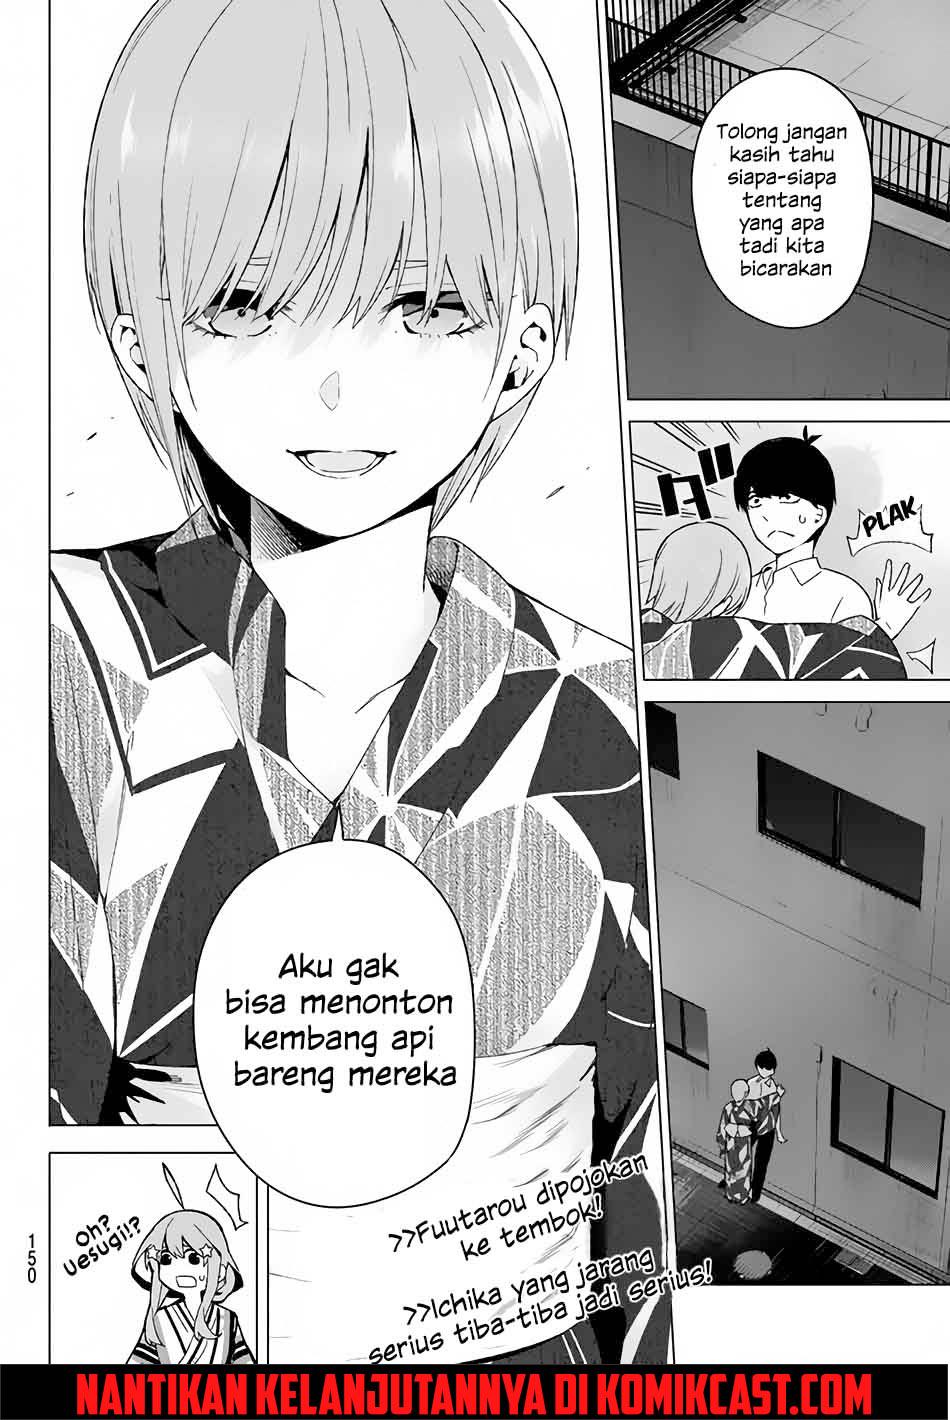 Baca Manga Go-toubun No Hanayome Chapter 9 Bahasa Indonesia